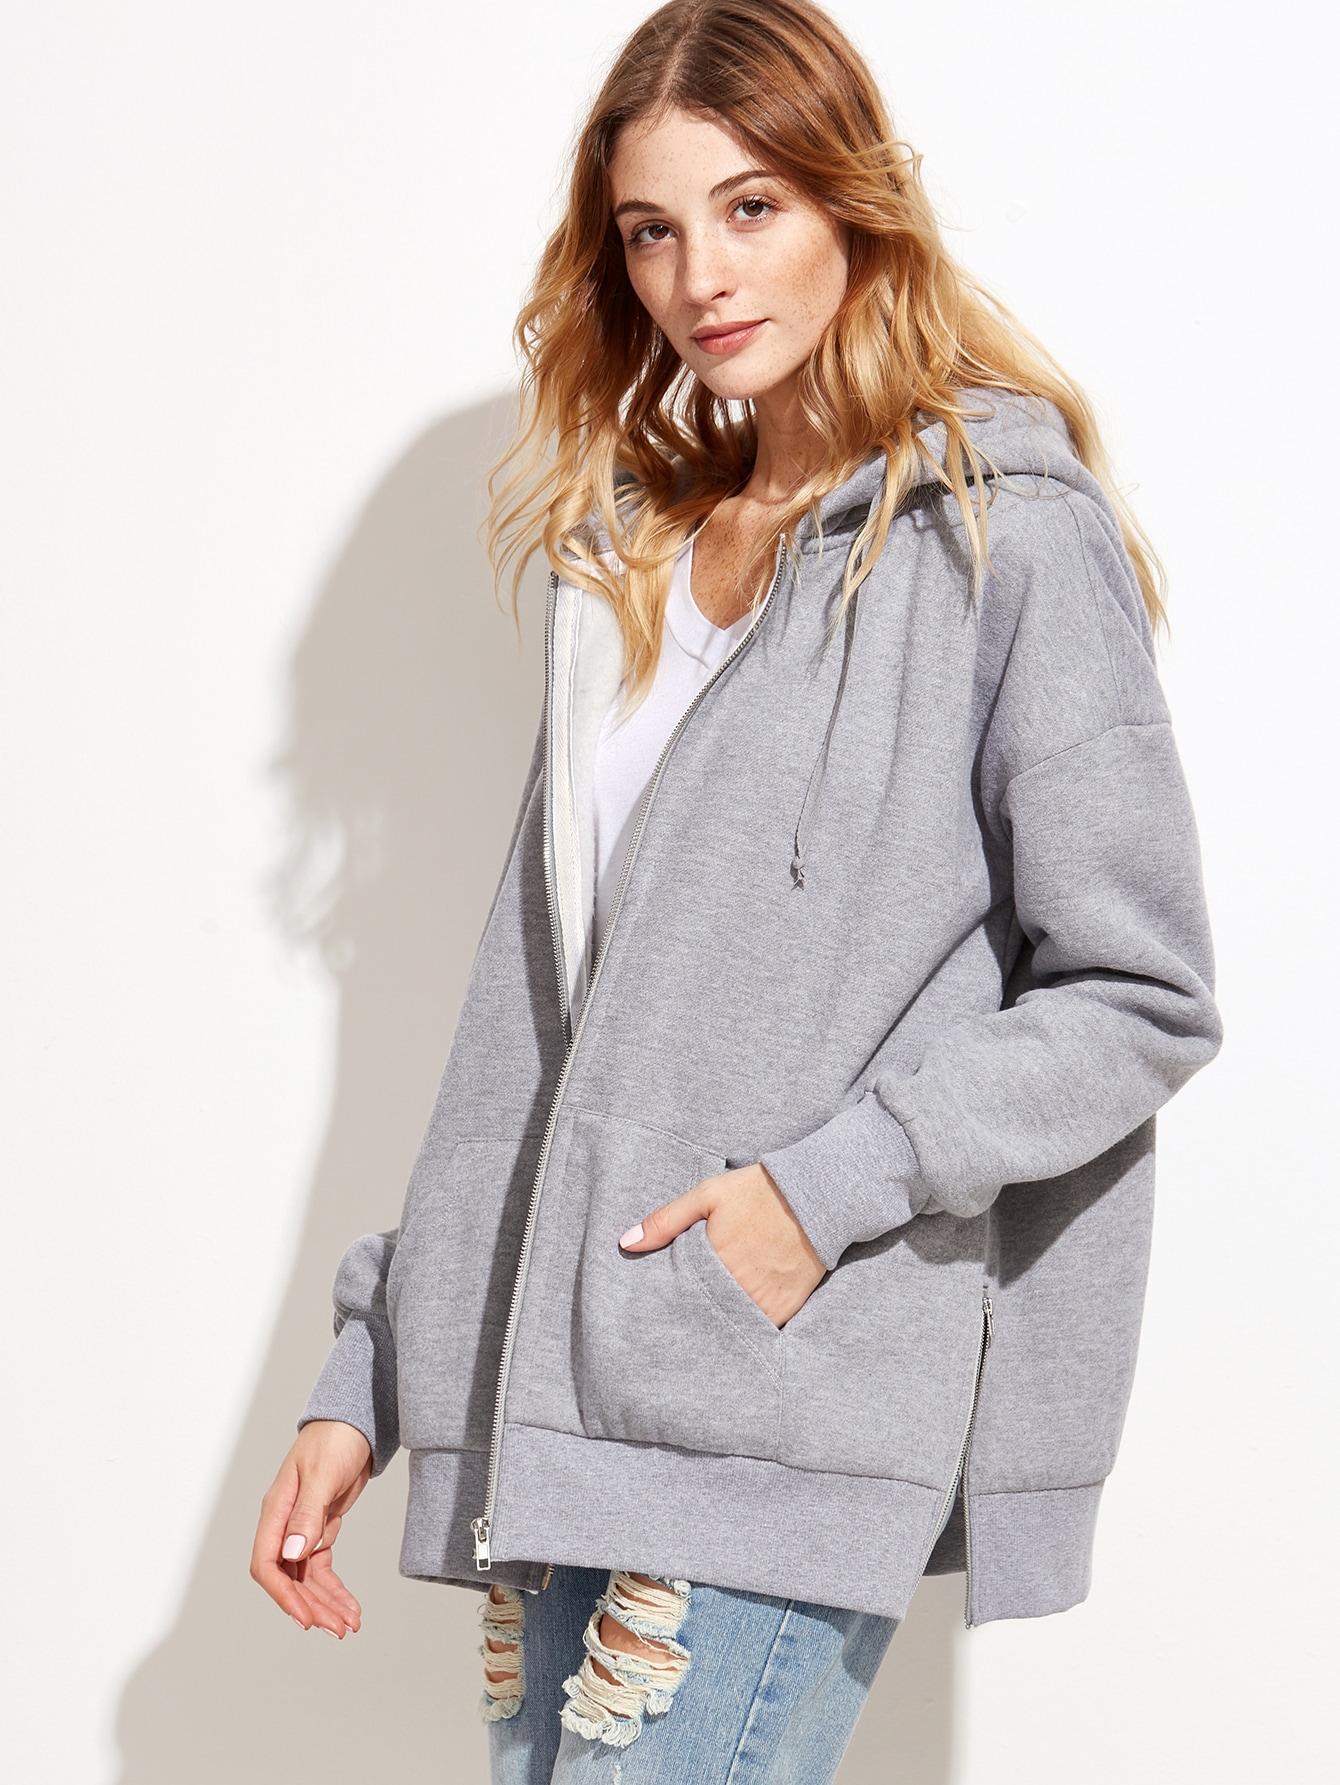 Grey Slit Side Zipper Front Hooded Sweatshirt sweatshirt160919703